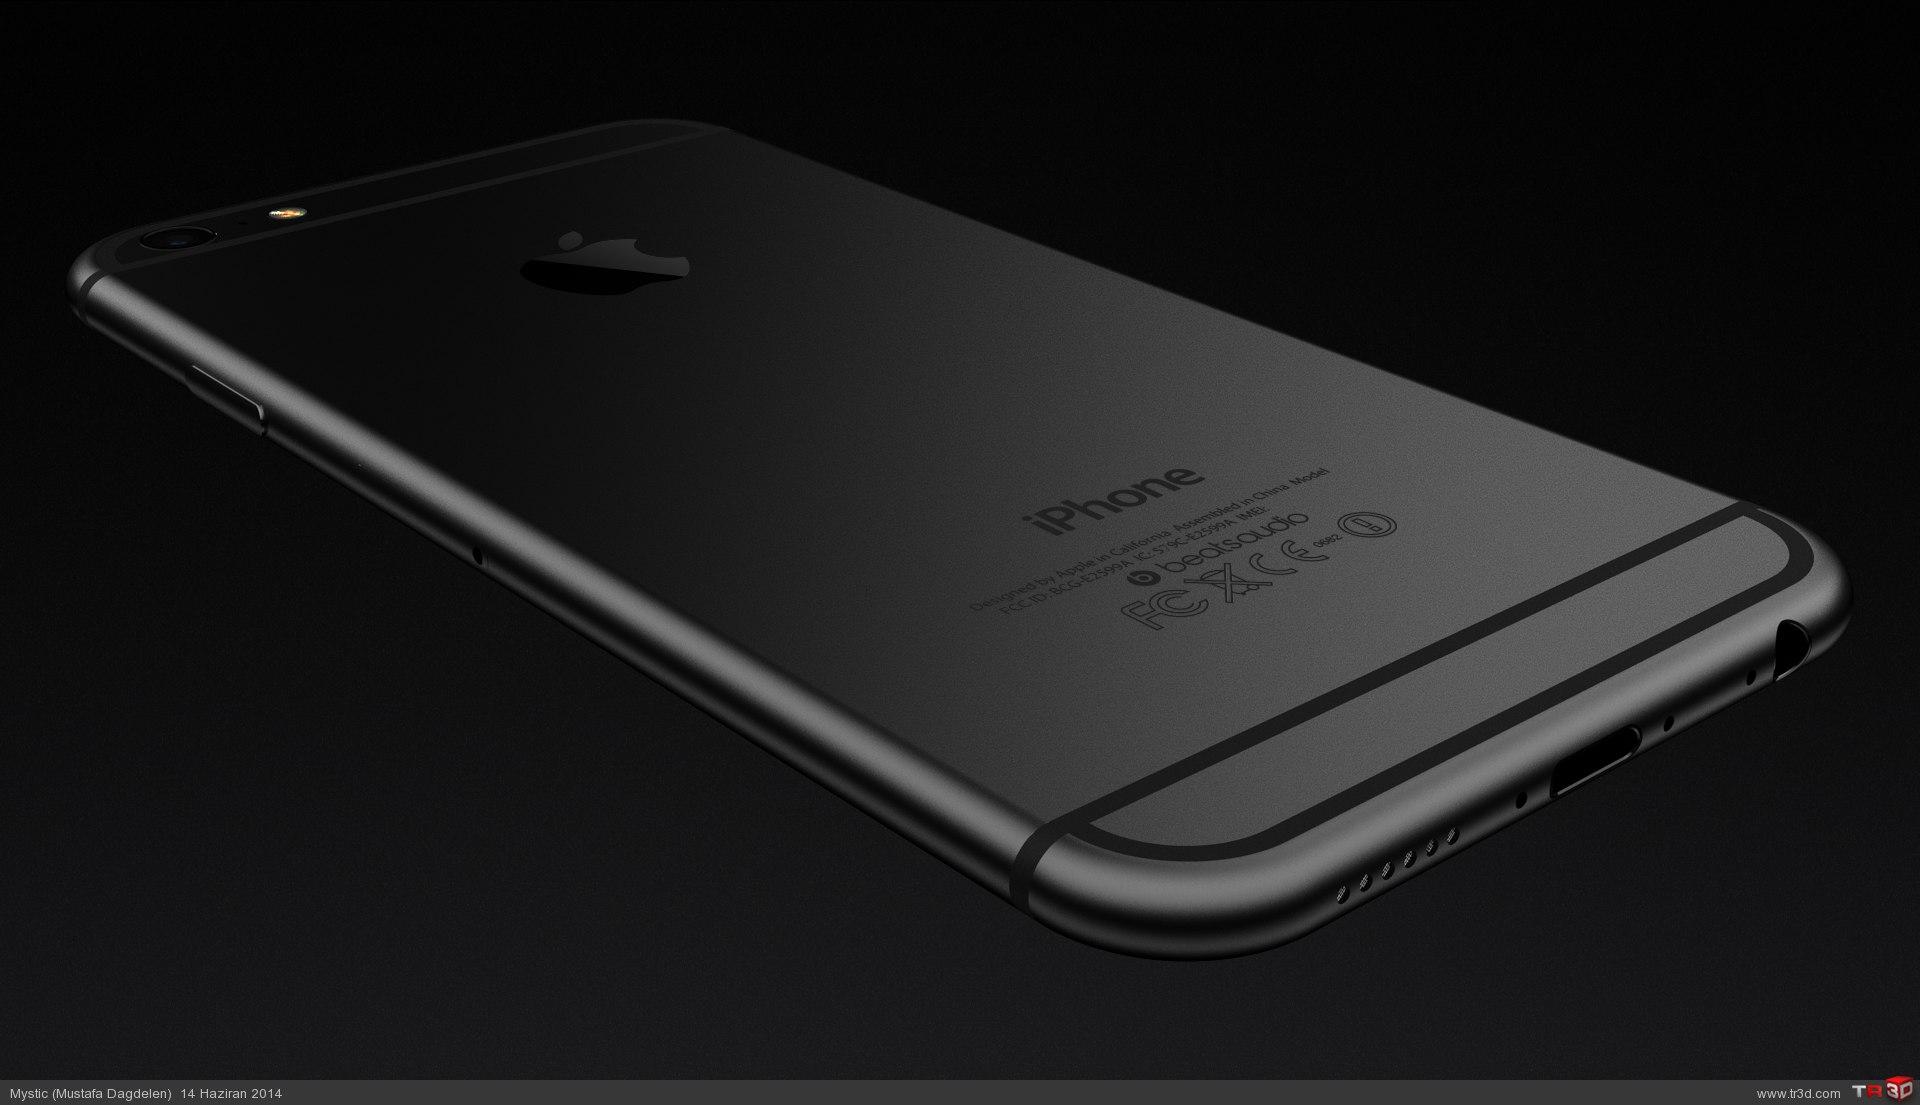 Apple iPhone 6 Finally 3